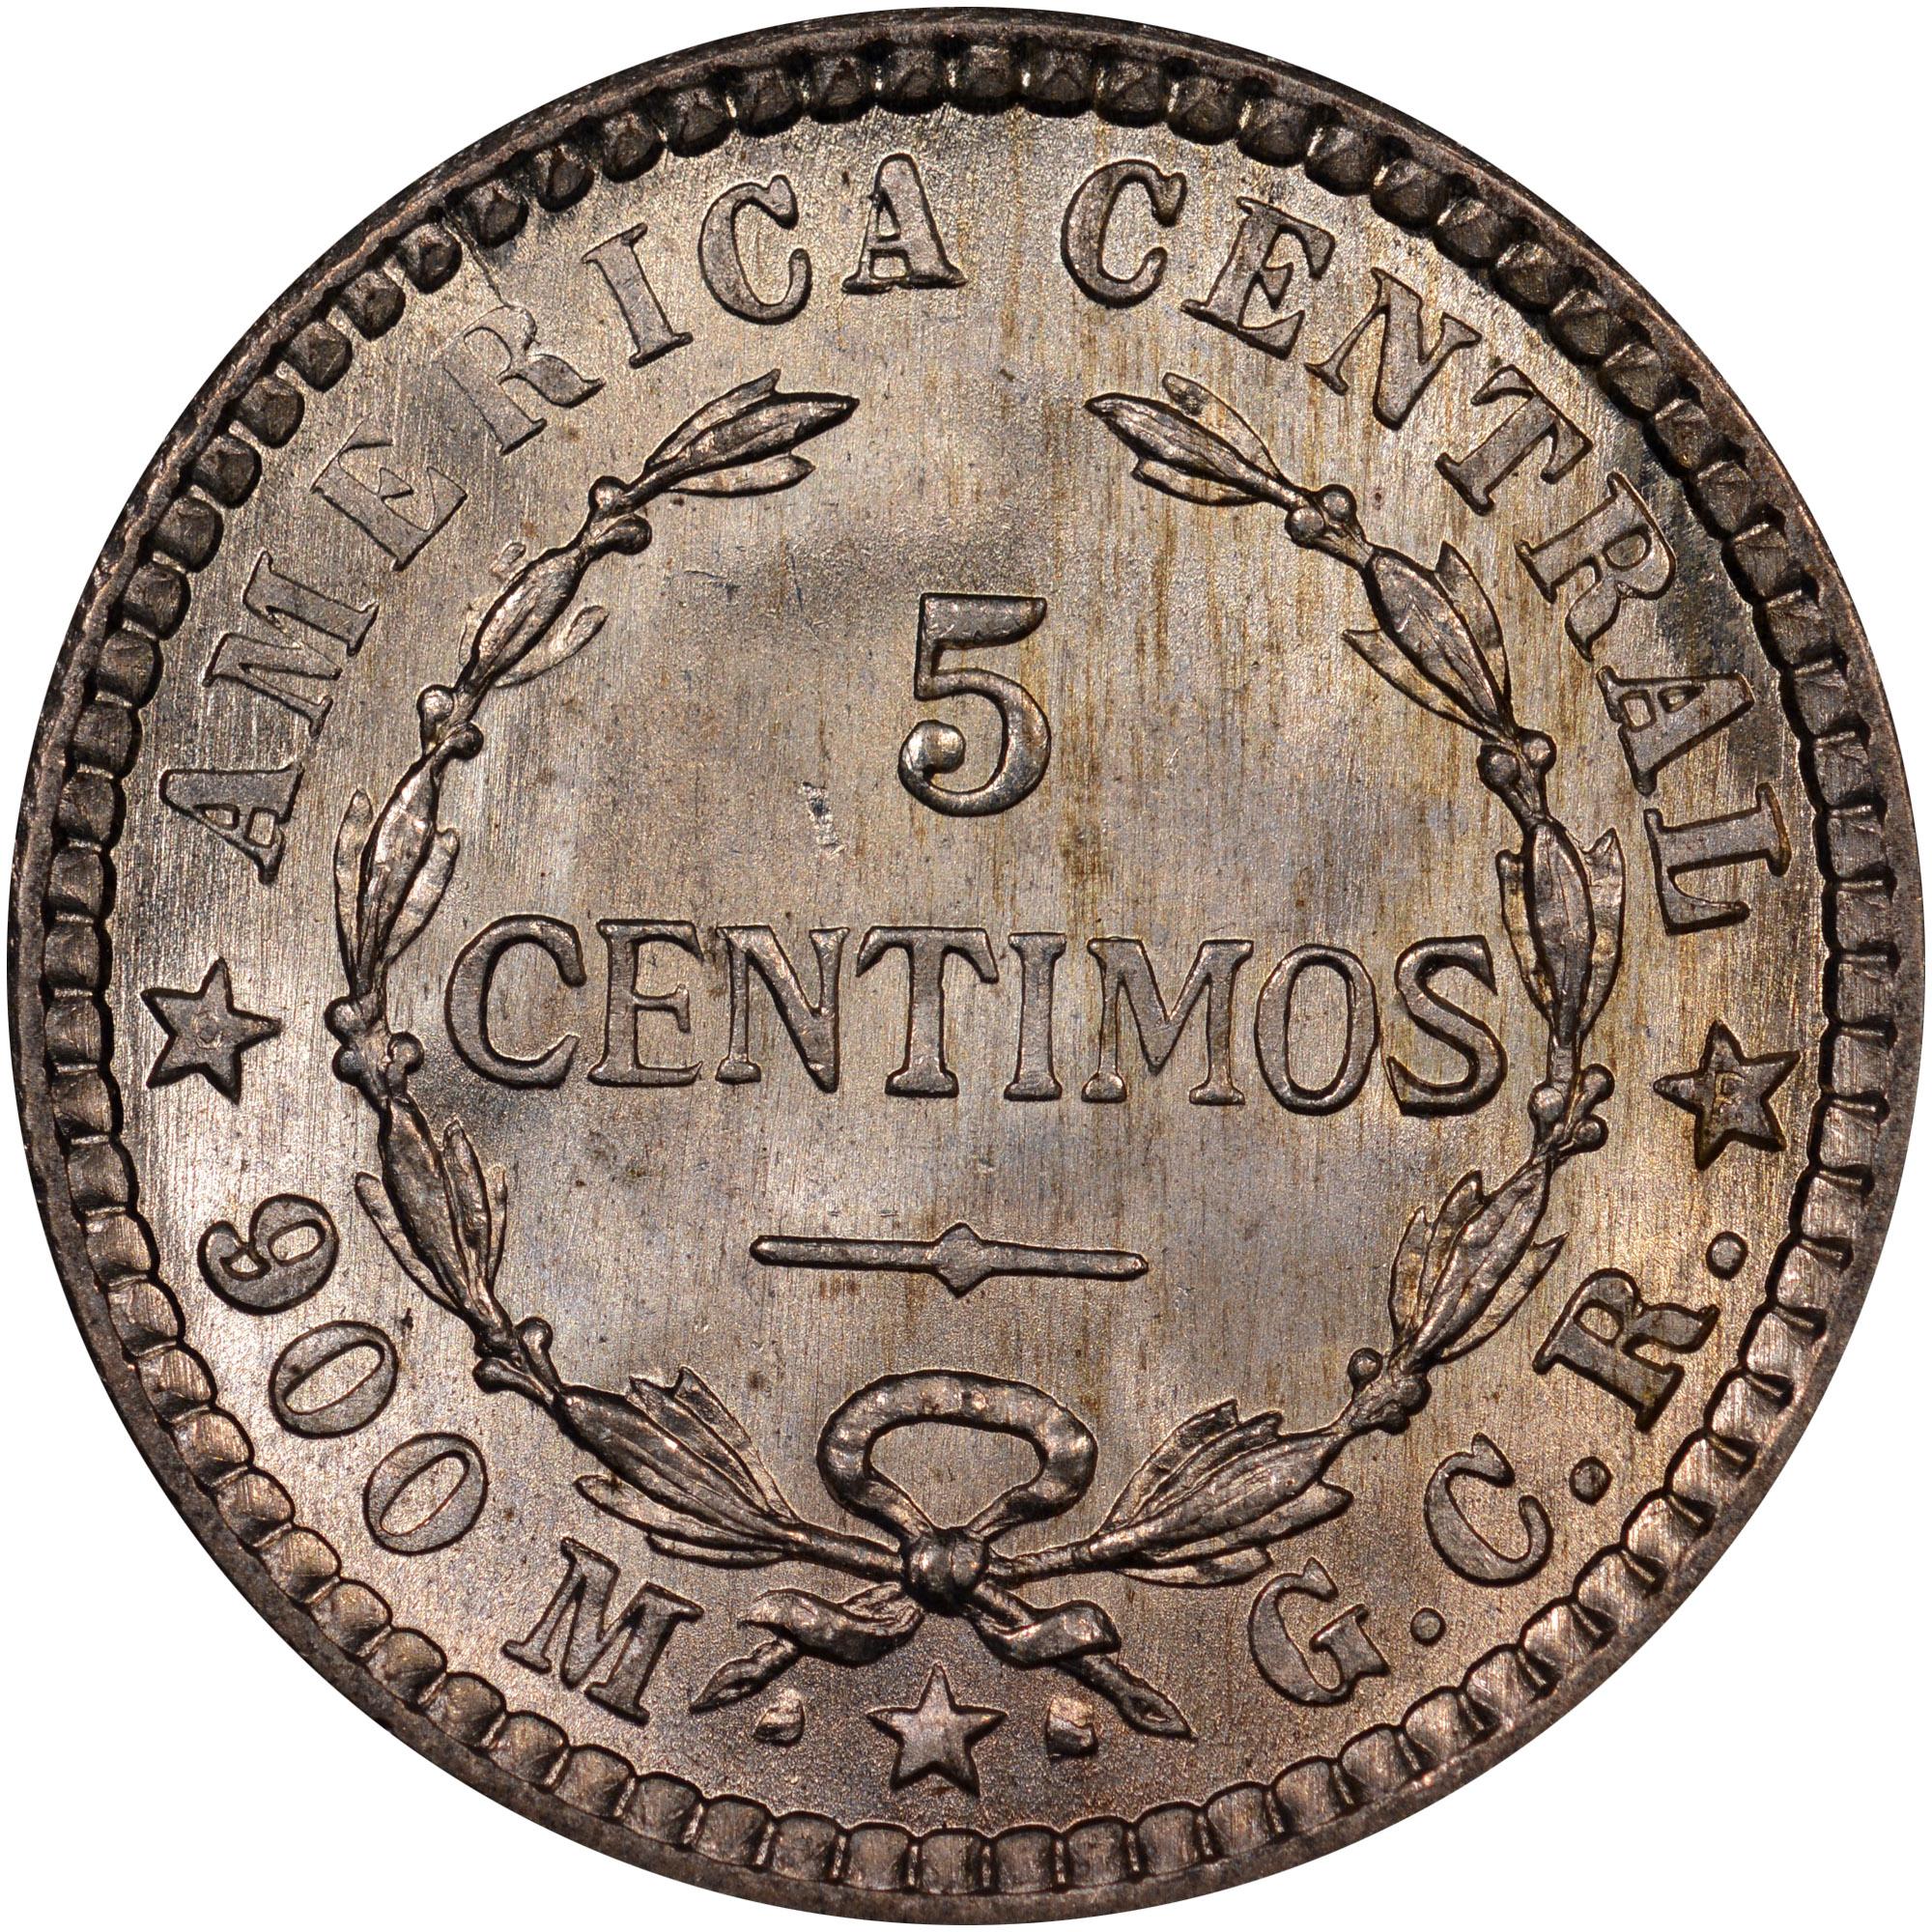 1905-1914 Costa Rica 5 Centimos reverse